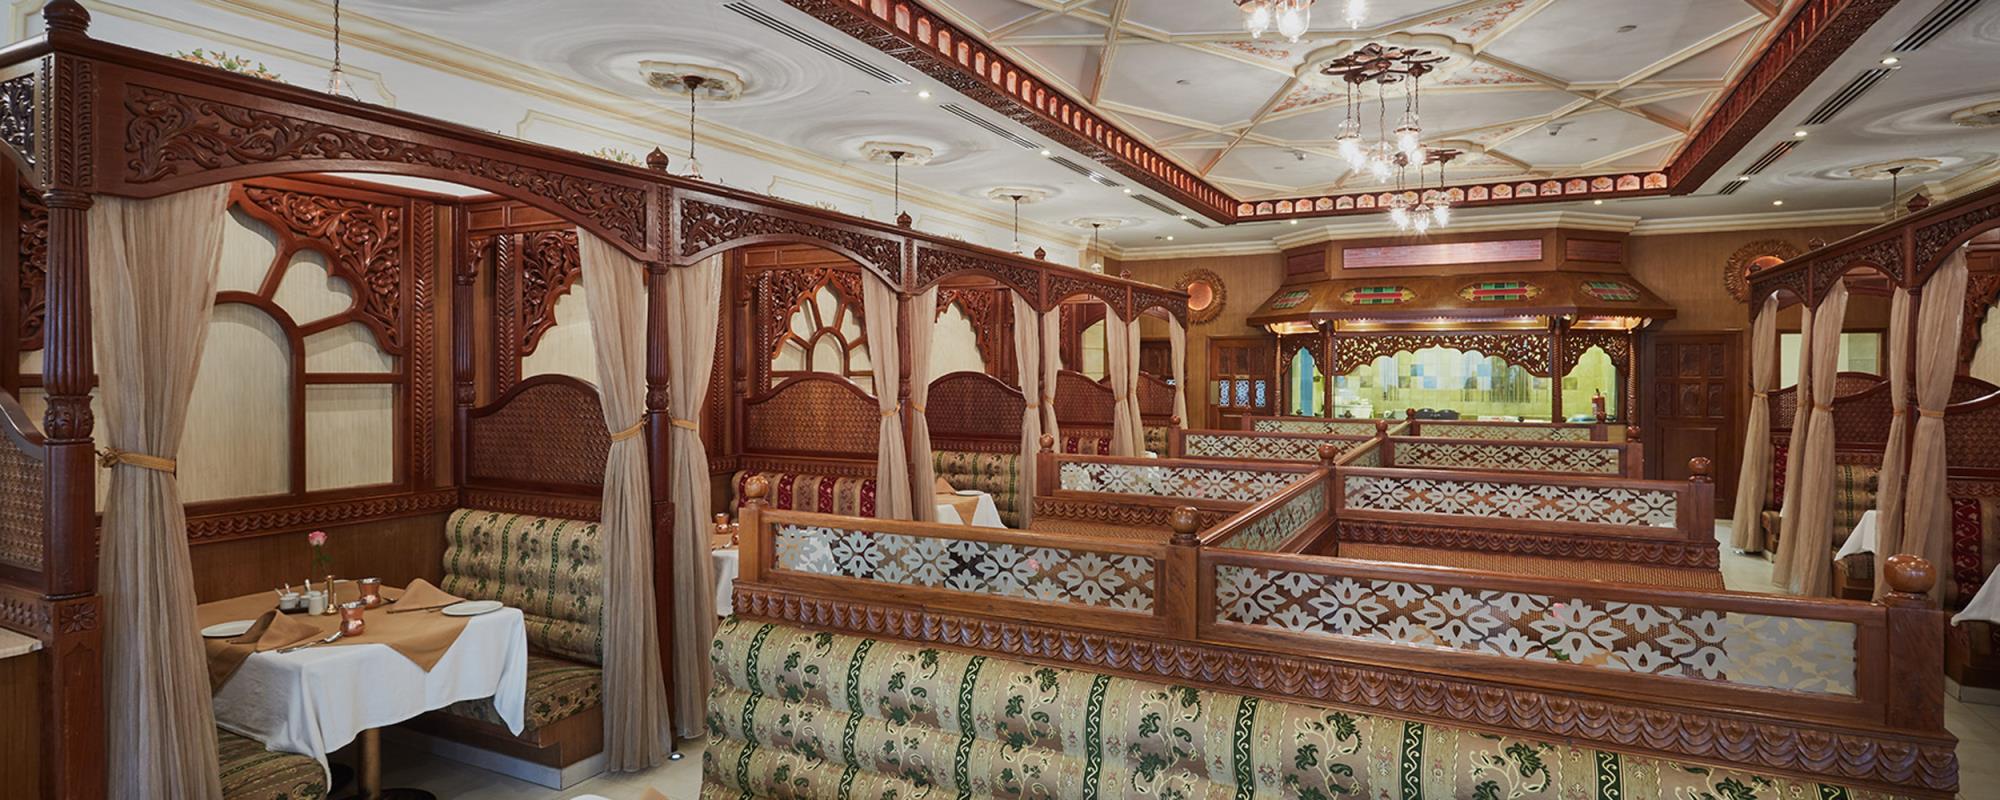 Arabian Palace Interior Heteen Palace Type C On Behance